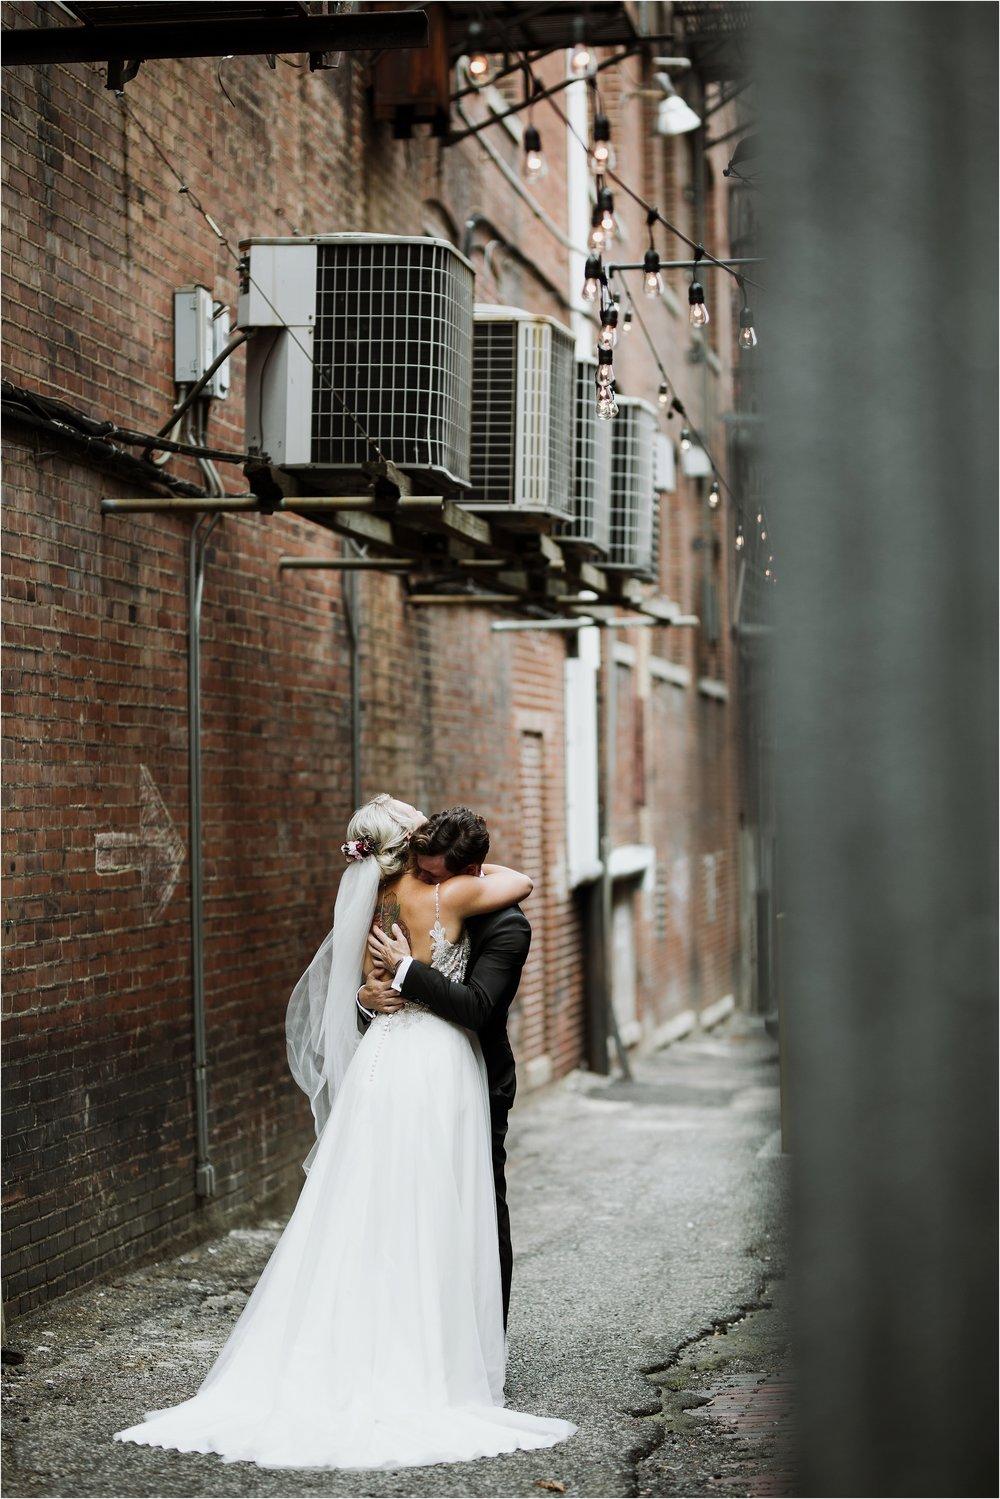 the-skeleton-root-wedding-photography-_0010.jpg